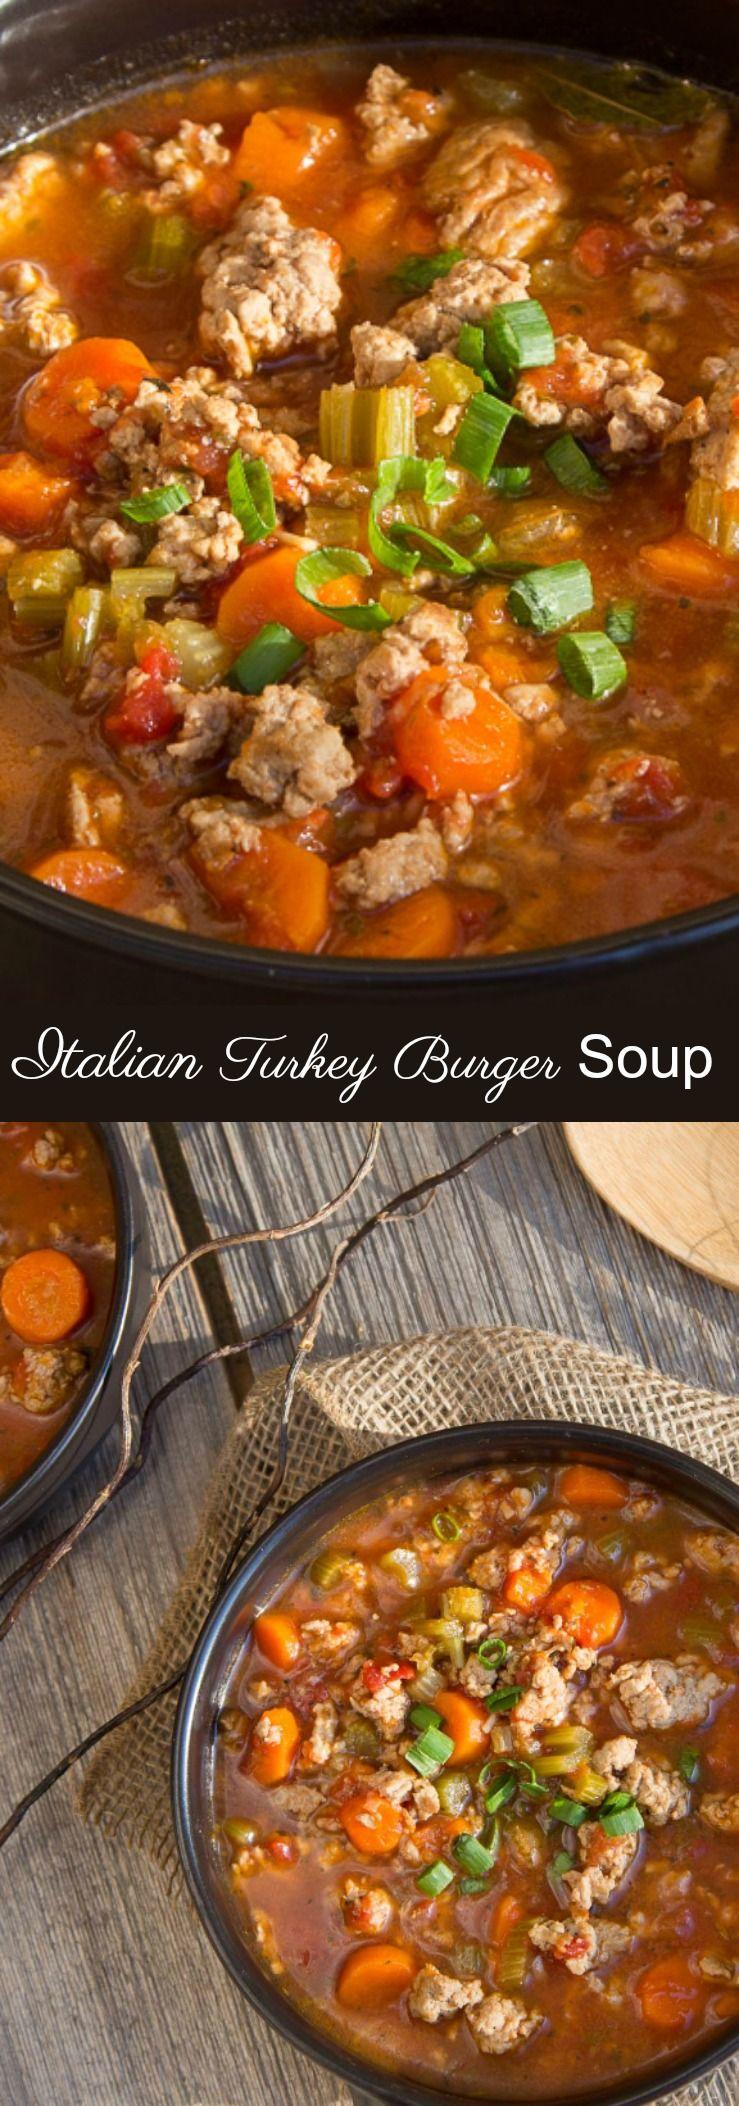 Italian Turkey Burger Soup